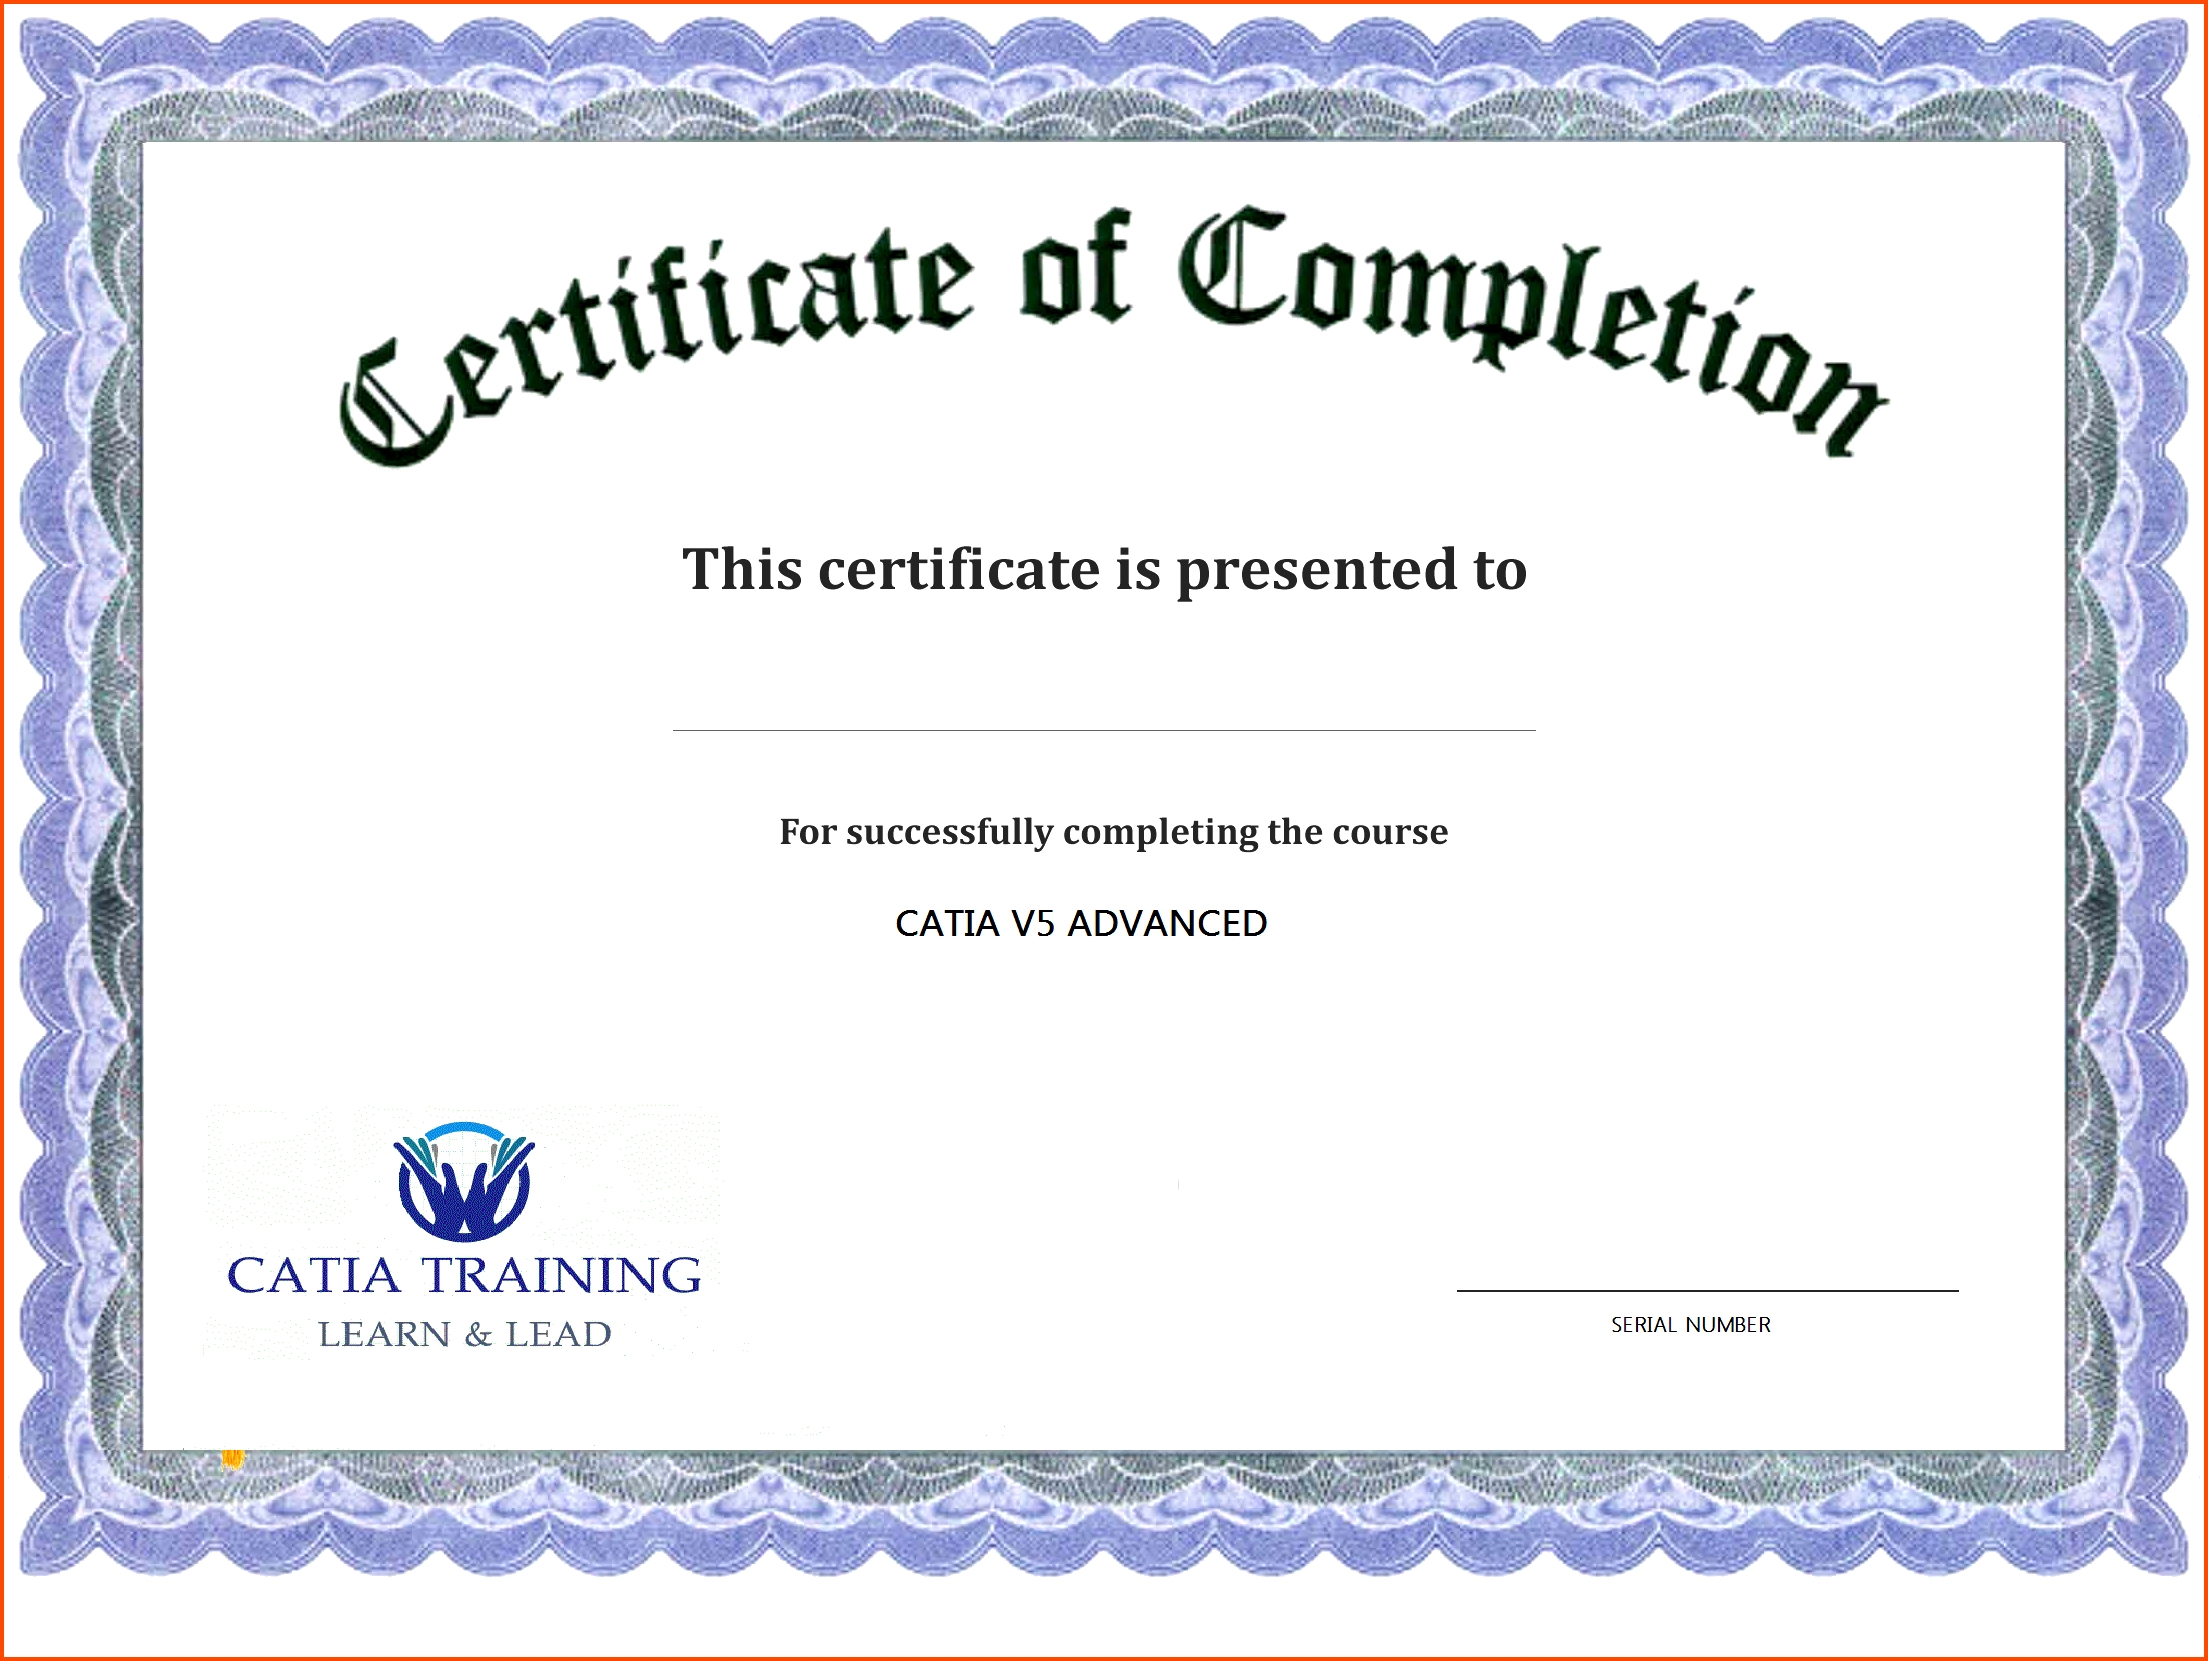 Certificate Template In Word   Safebest.xyz Intended For Training Certificate Template Word Format